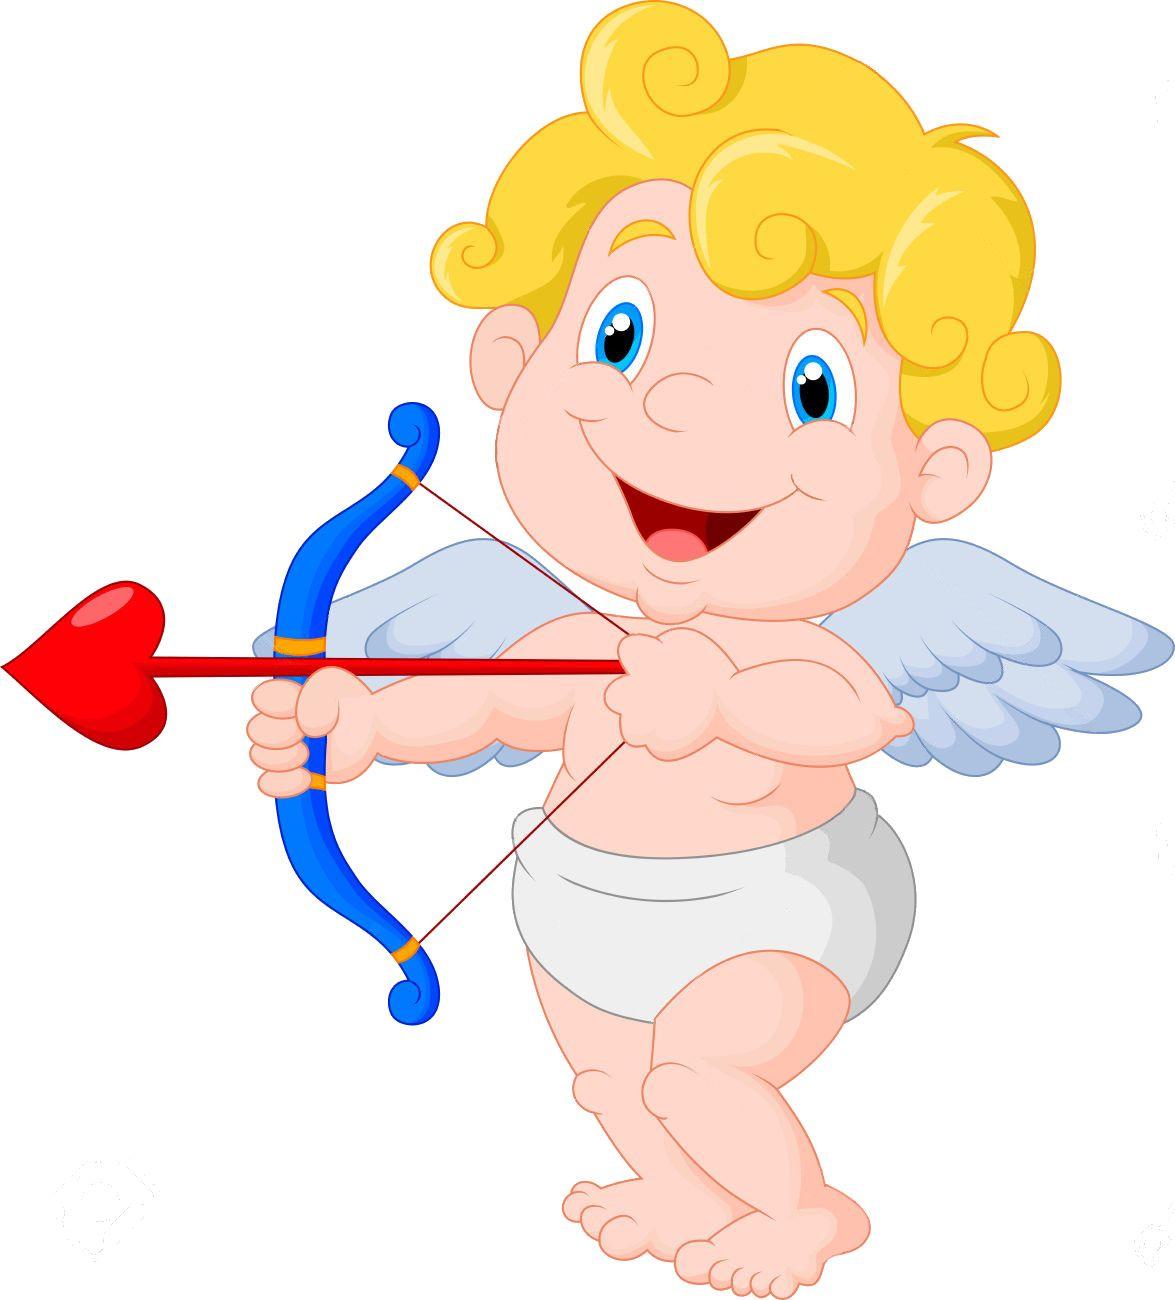 Pin by KAVAERCA on DIBUJOS DE ANGELES | Cupid, Alien